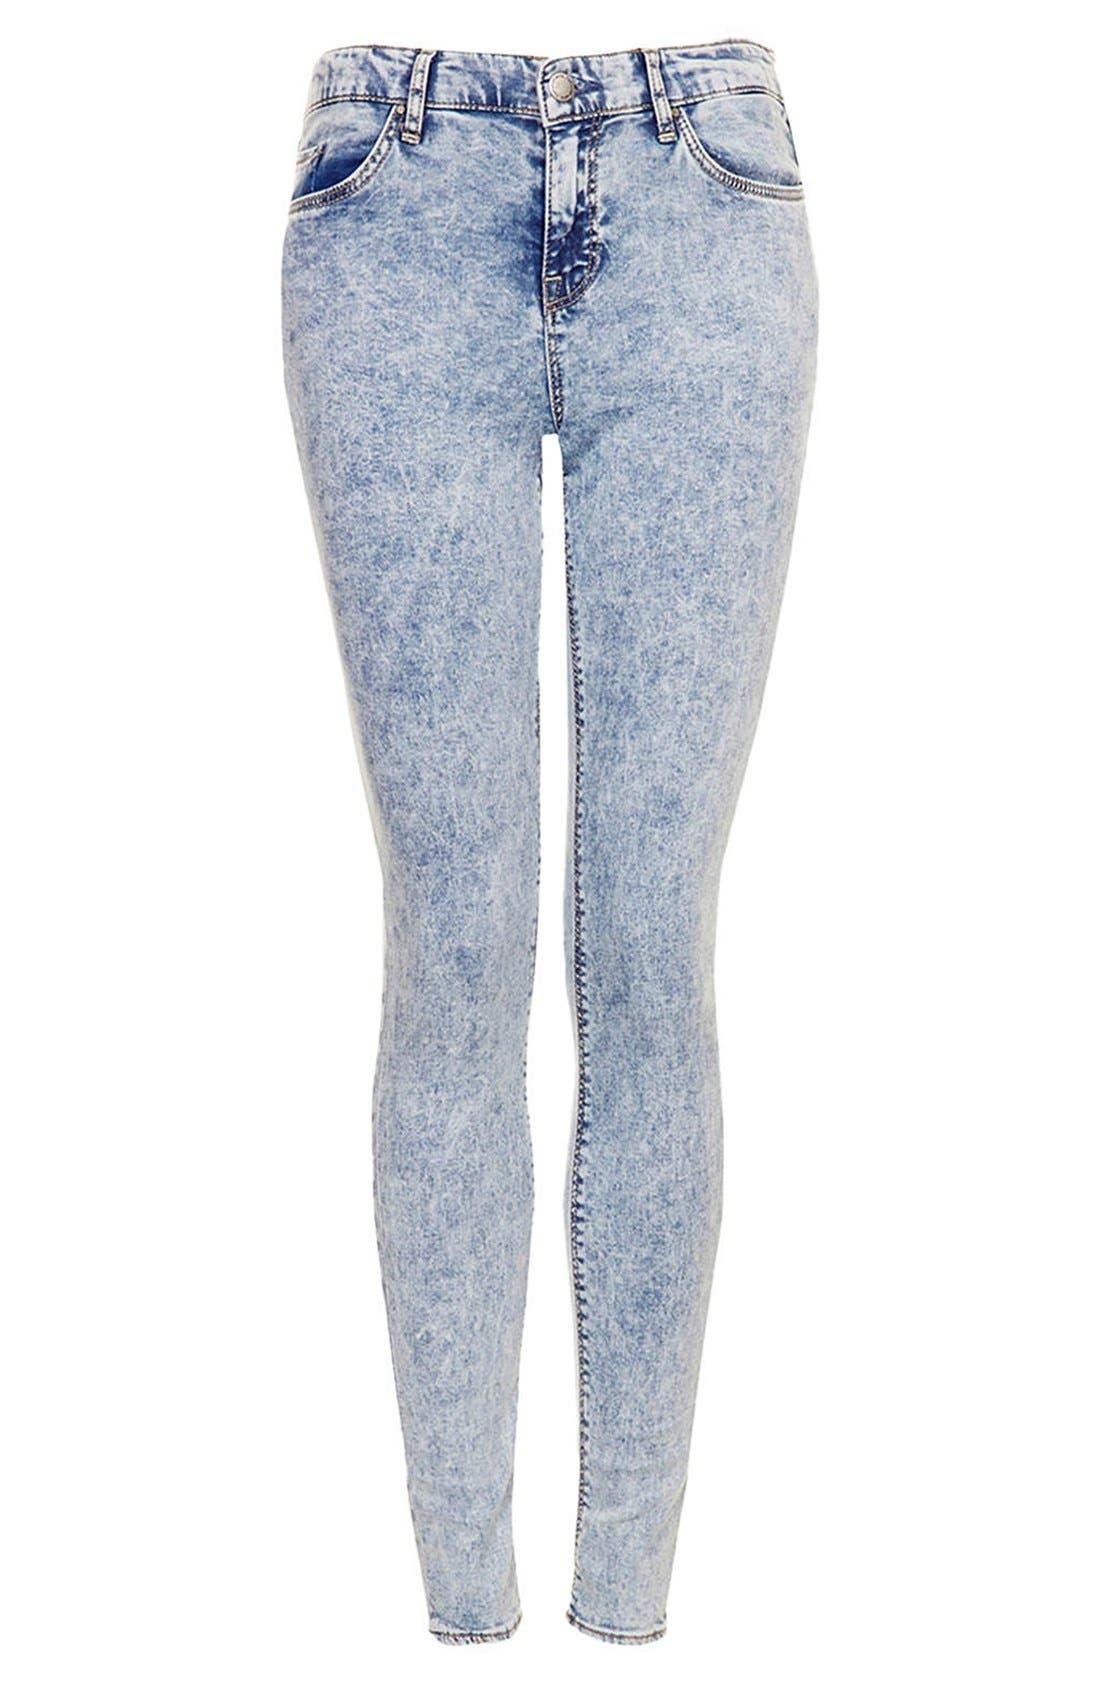 Alternate Image 3  - Topshop Moto 'Leigh' Acid Wash Skinny Jeans (Mid Stone) (Regular & Short)